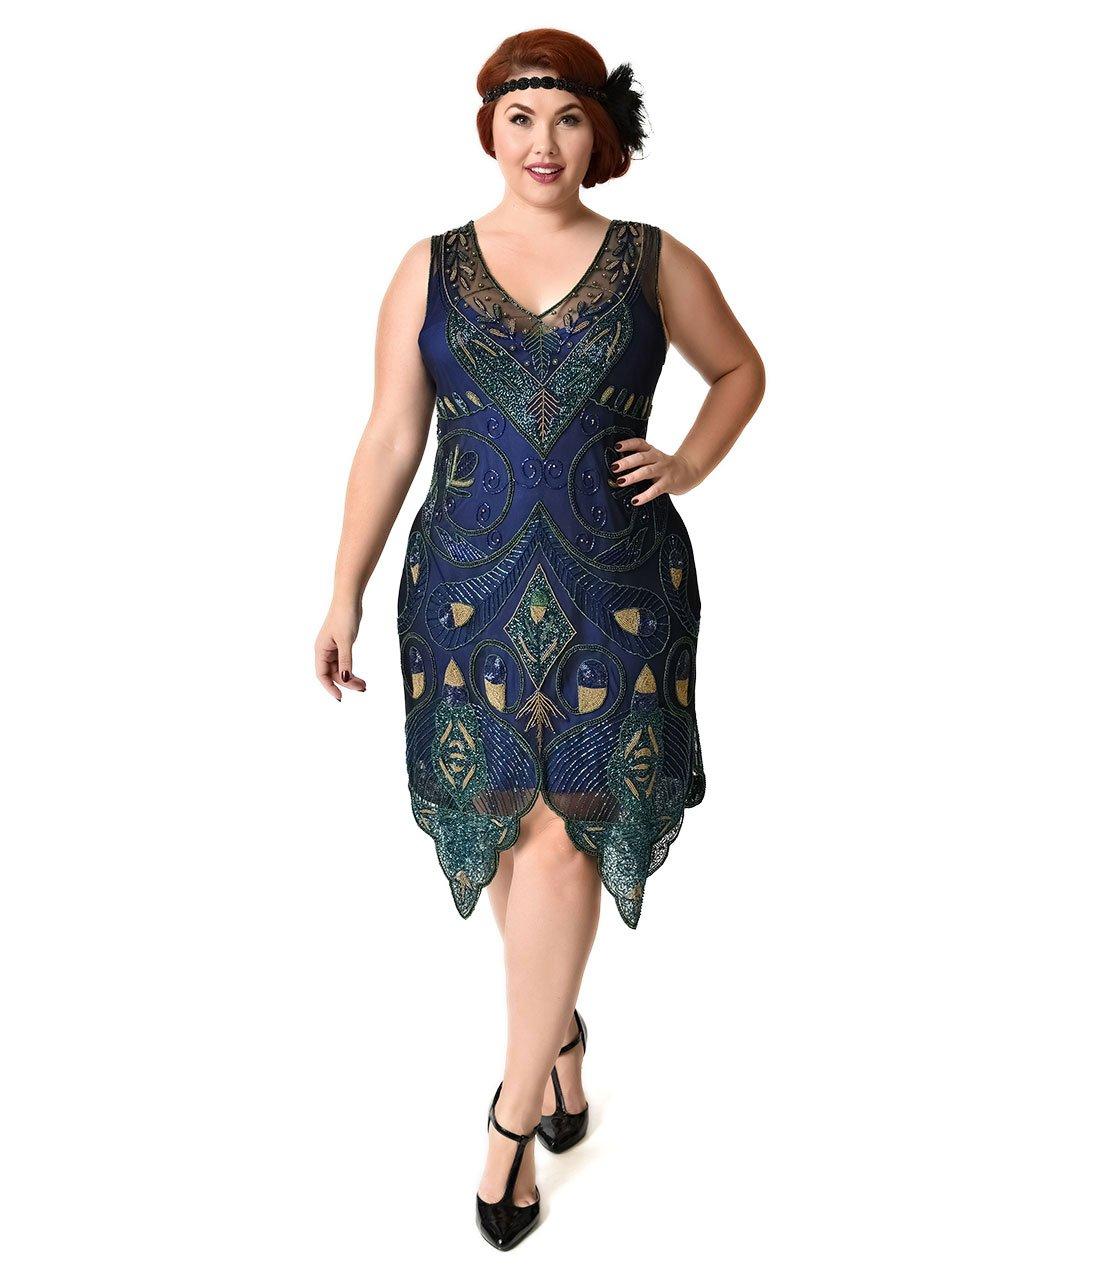 Unique Vintage 1920s Style Plus Size Navy Blue & Green Beaded Emma Flapper Dress